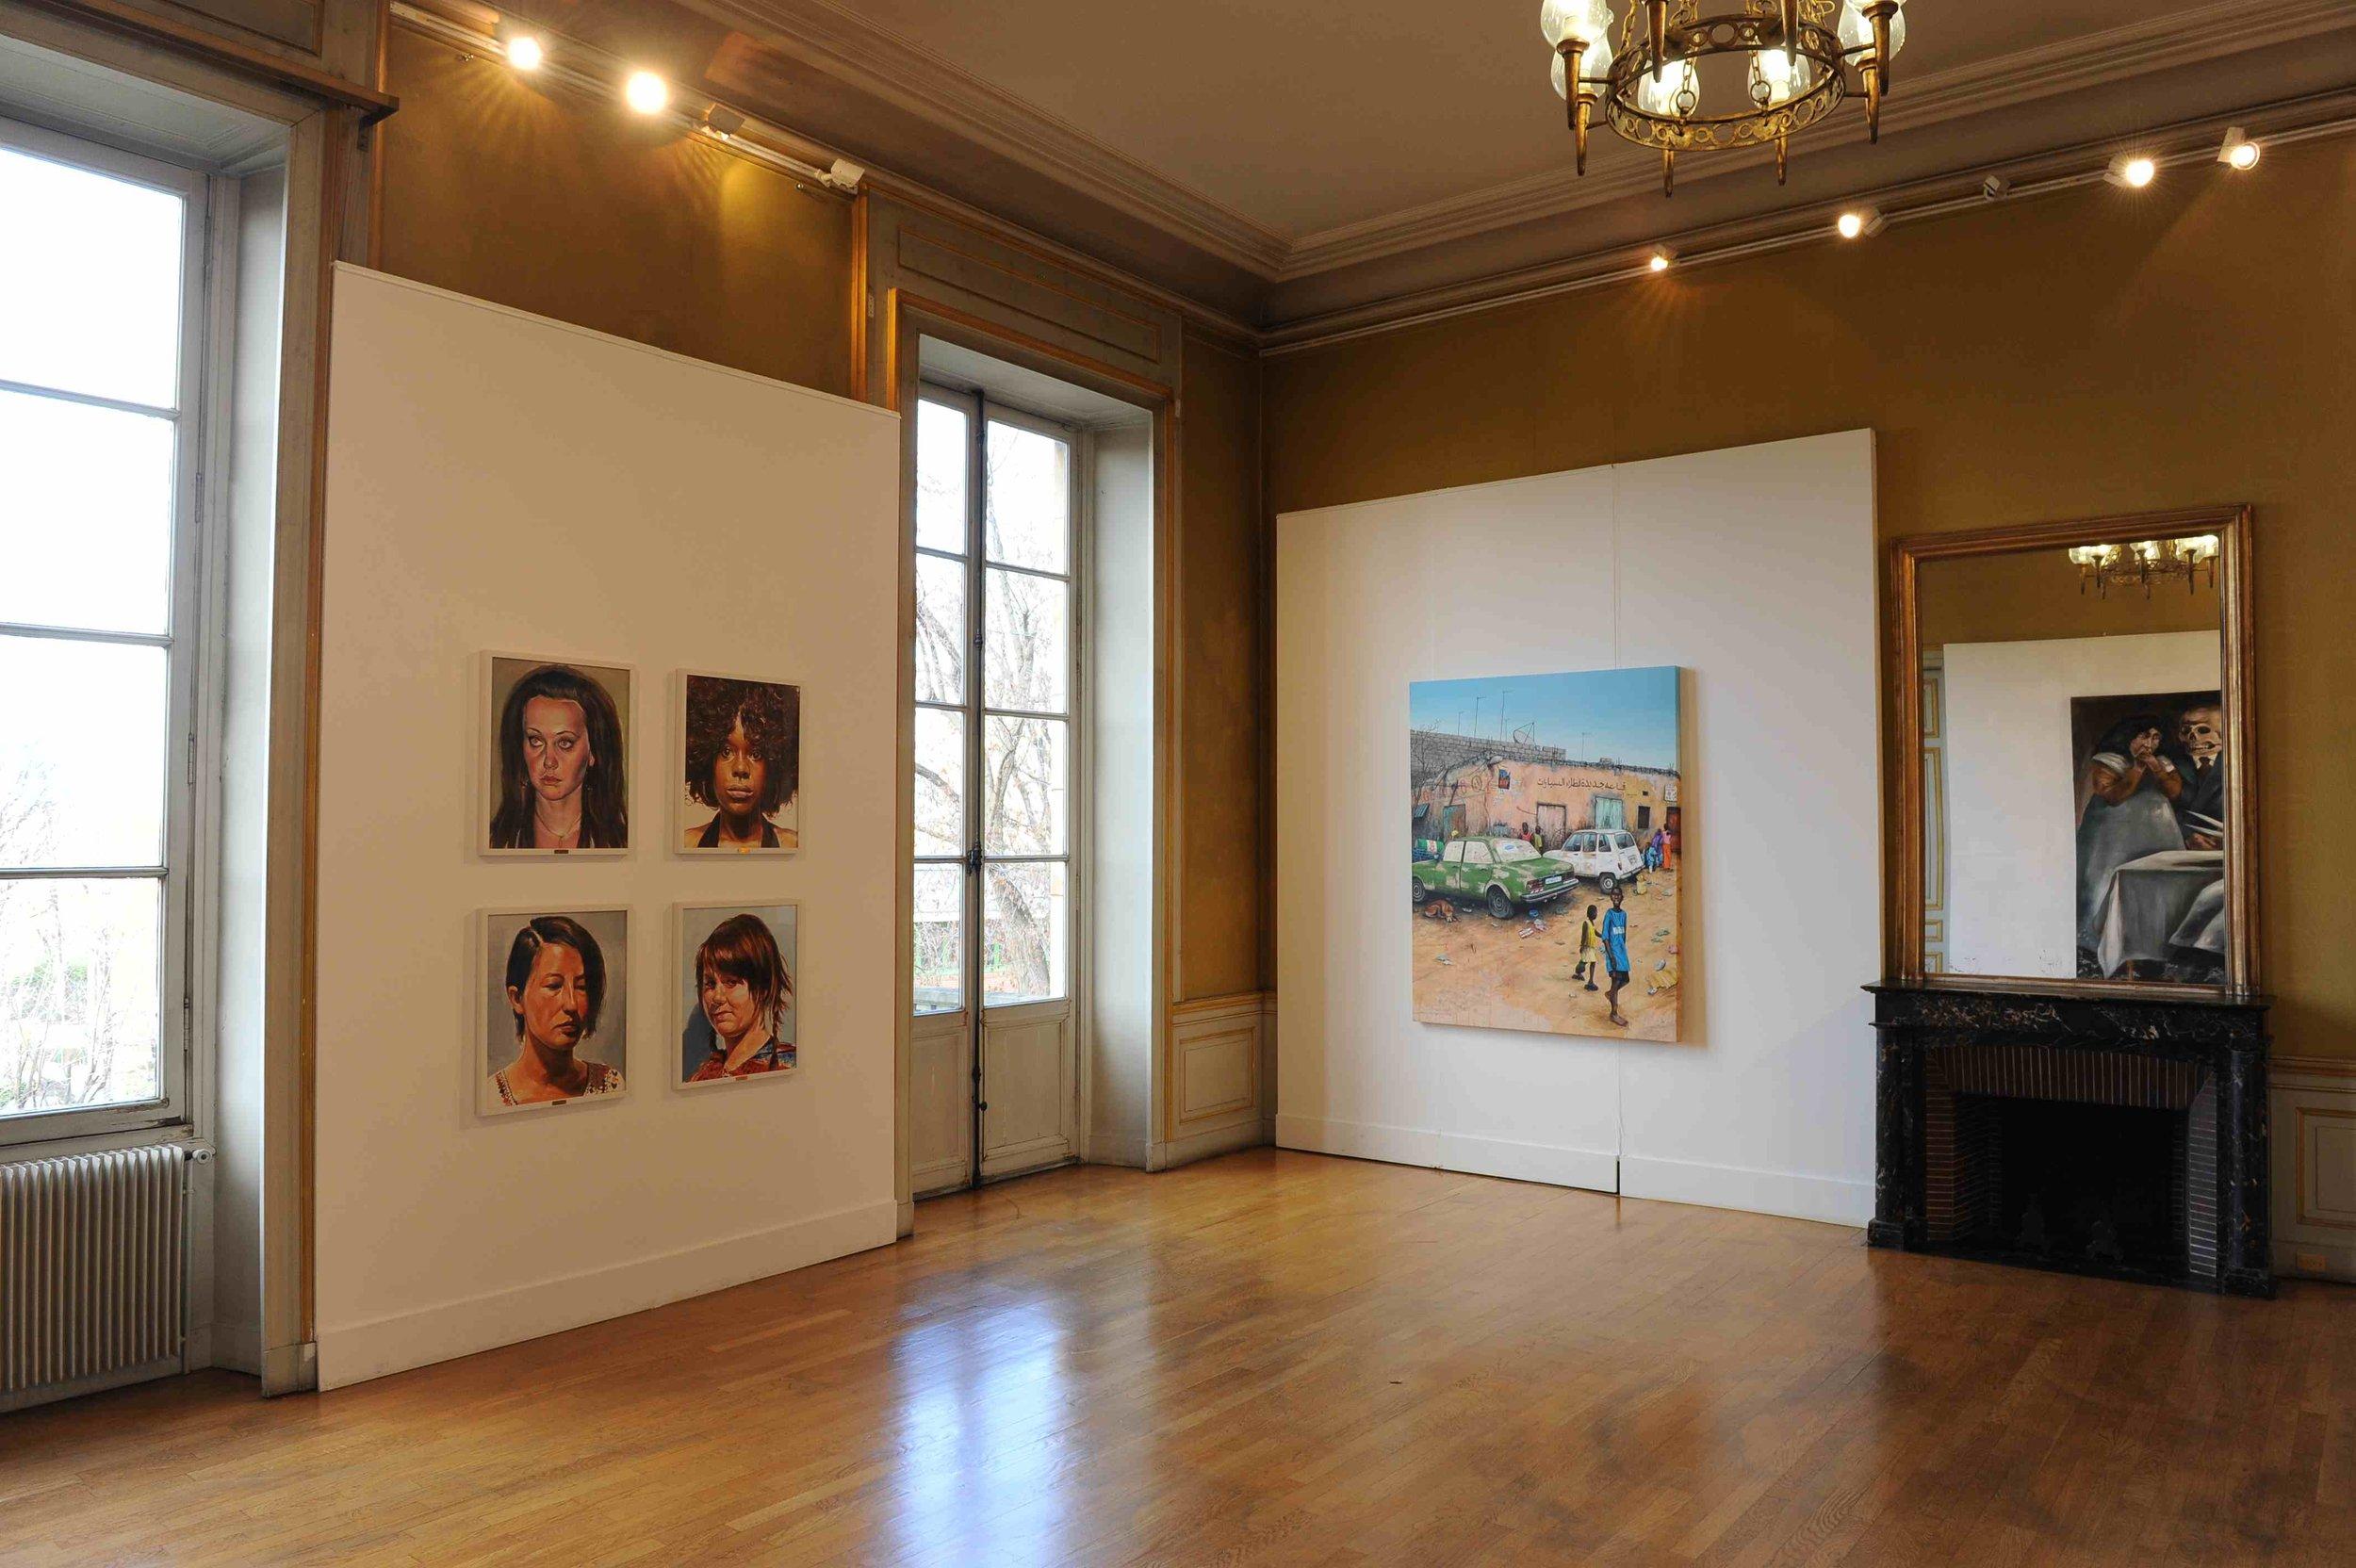 Des paysages, des Figures, Château de St Ouen, 2011.Curator Olivier Masmonteil.Artists in view : Axel Pahlavi, Julien Benetton, Gregory Forstner